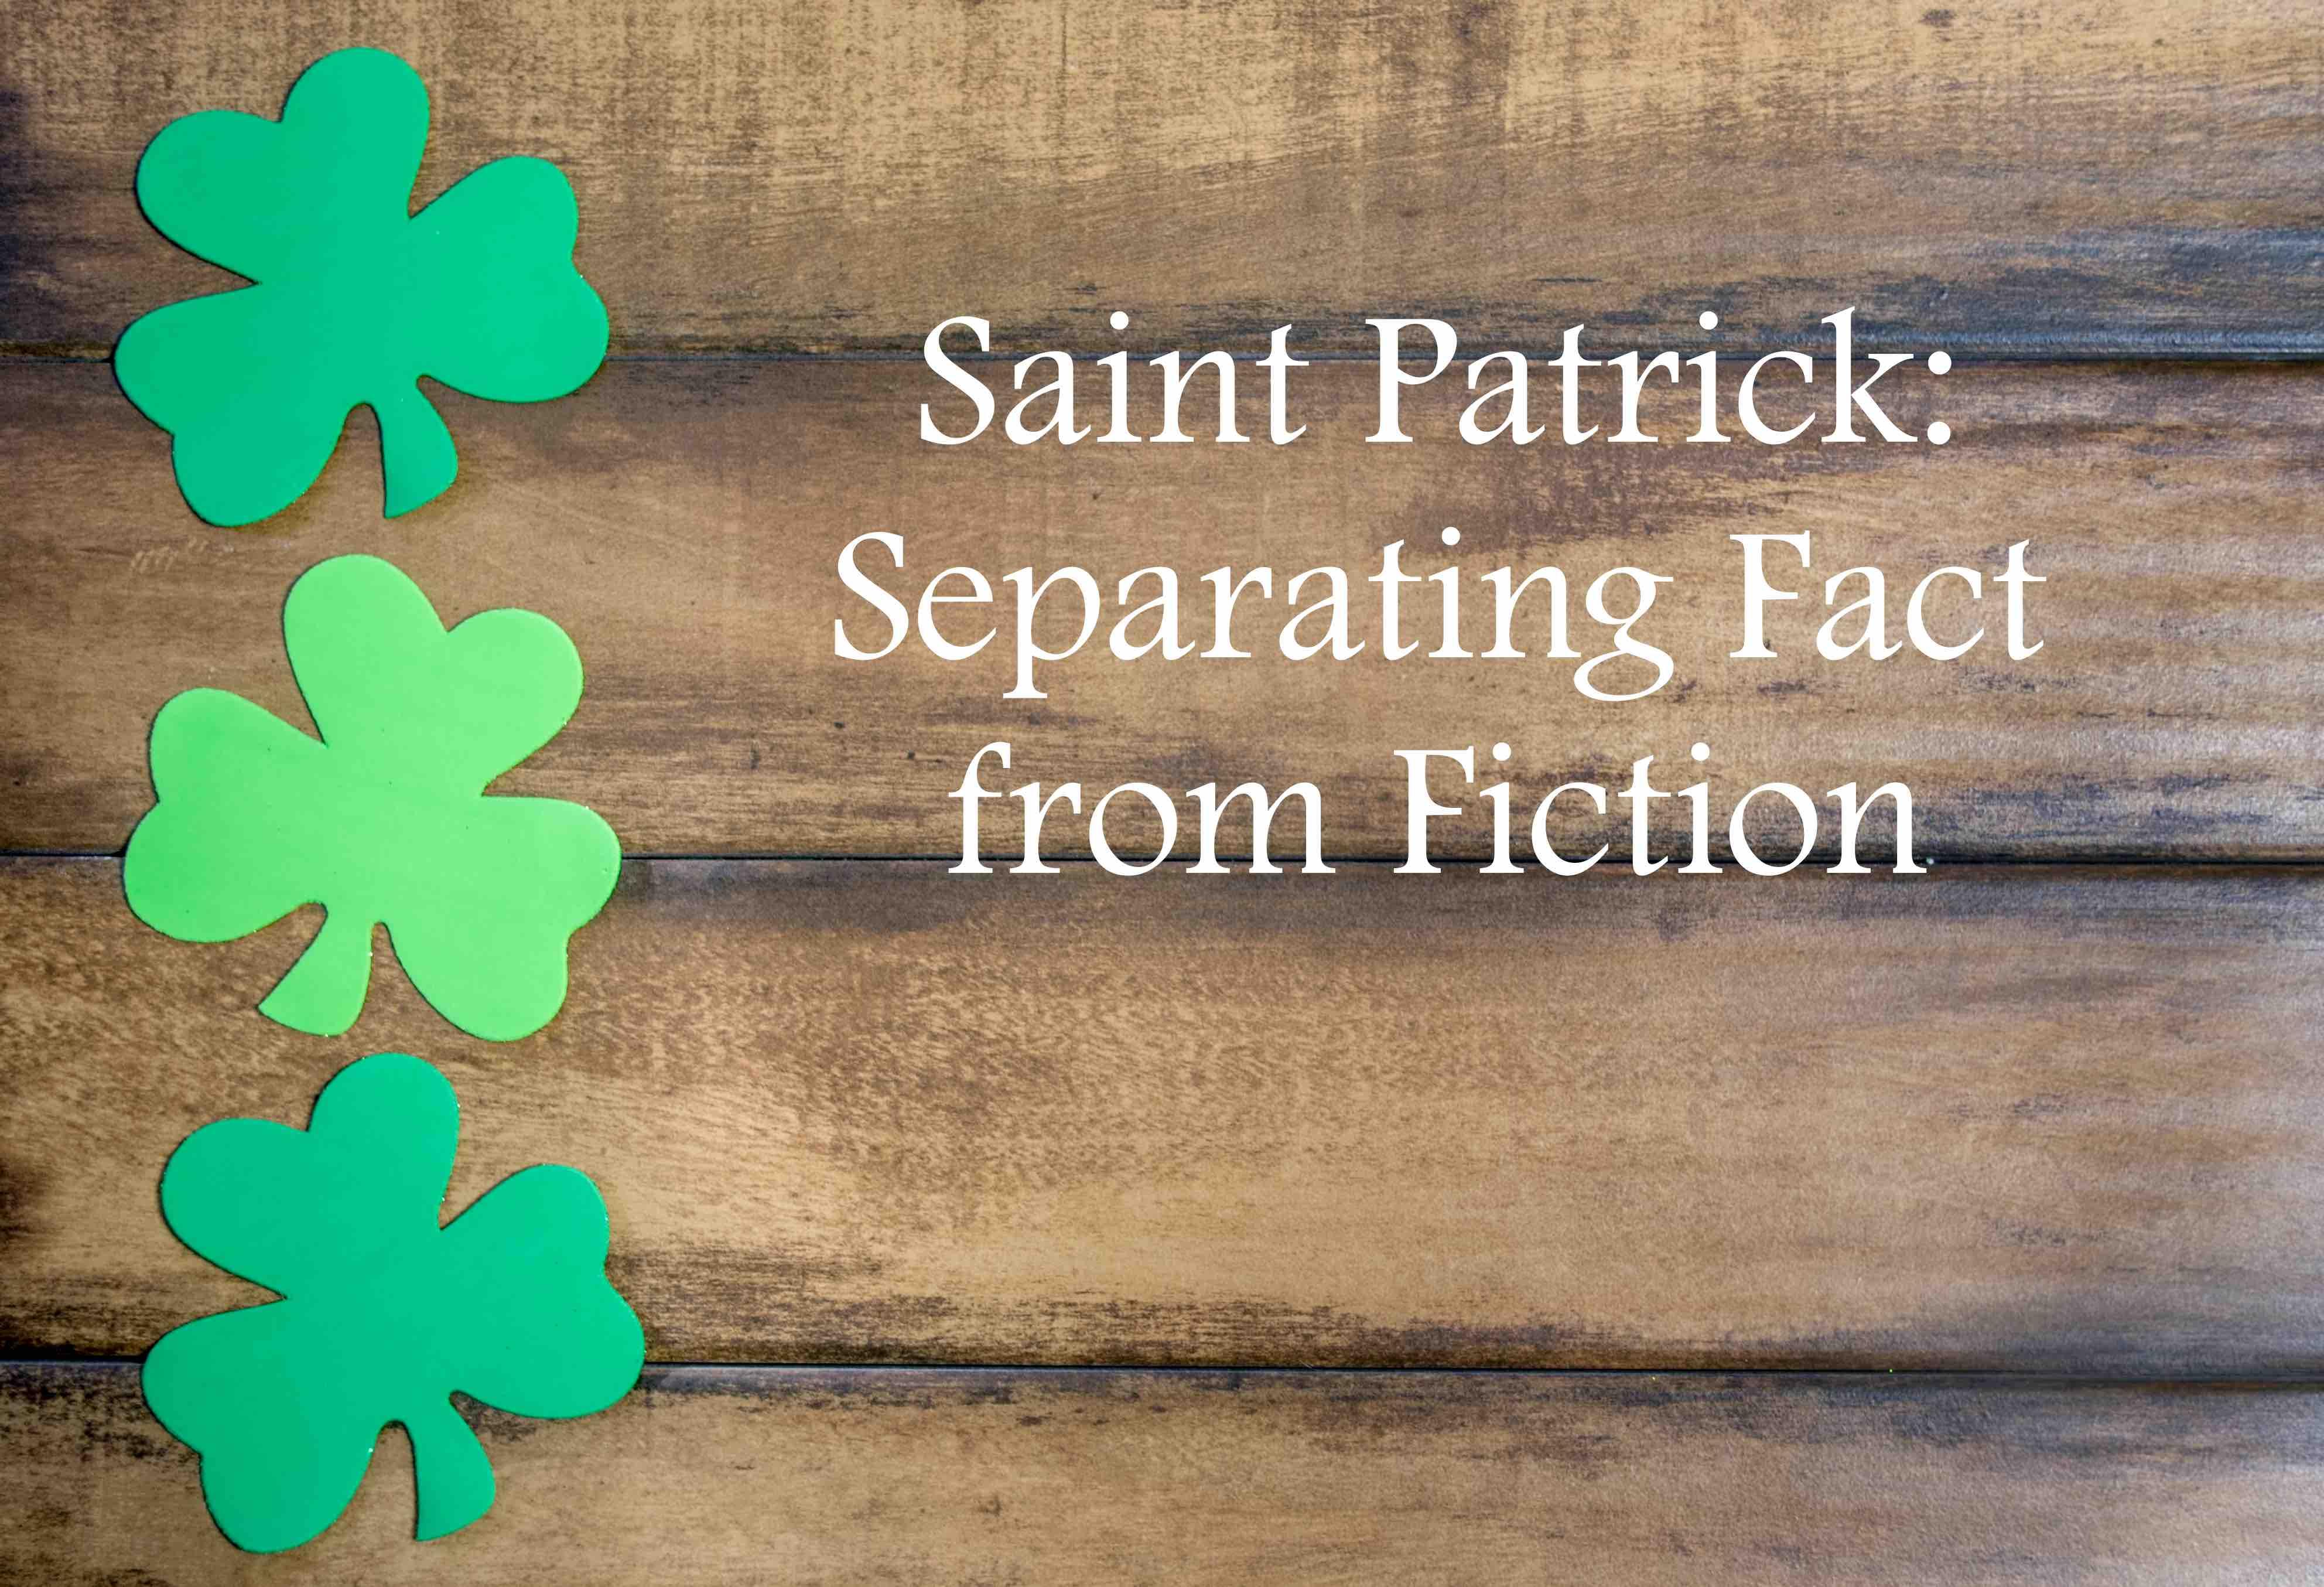 St. Patrick's Blog